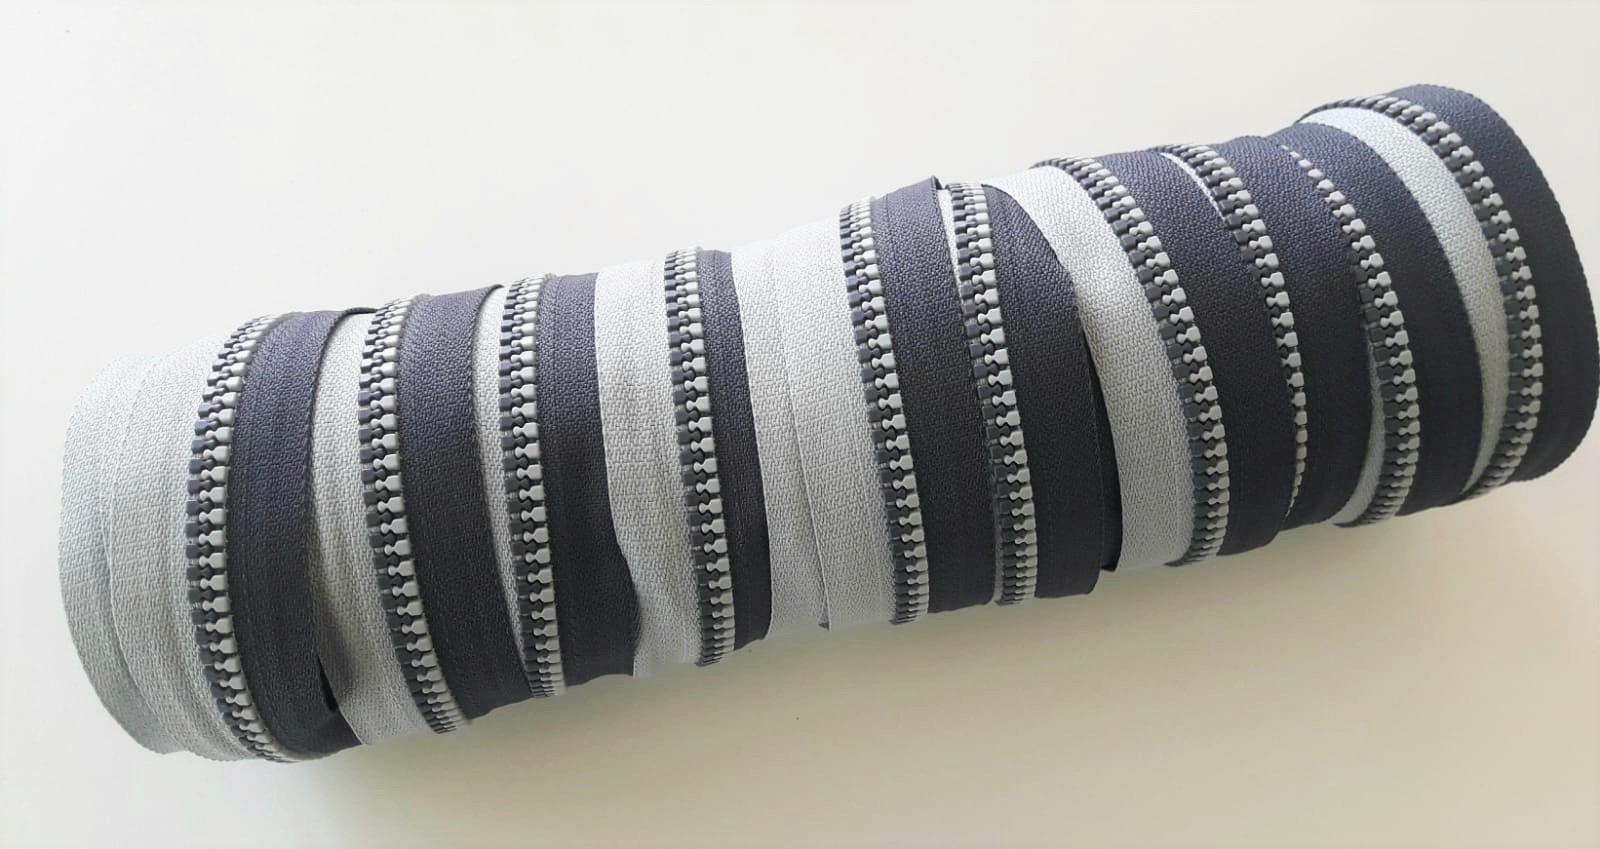 EP hellgrau/dunkelgrau Endlos-Reißverschluss 20 cm